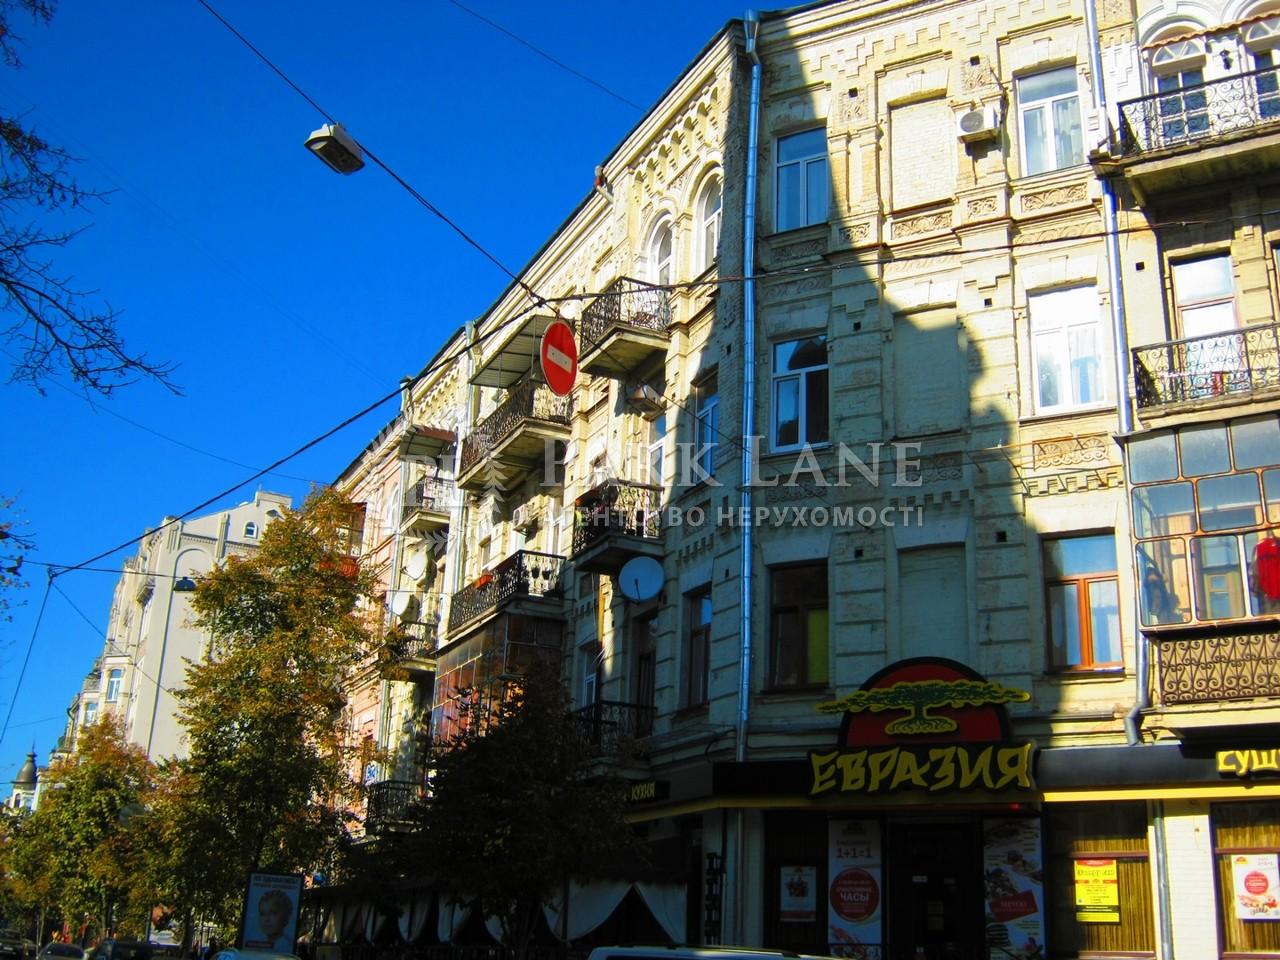 Квартира ул. Ярославов Вал, 8, Киев, R-21761 - Фото 2